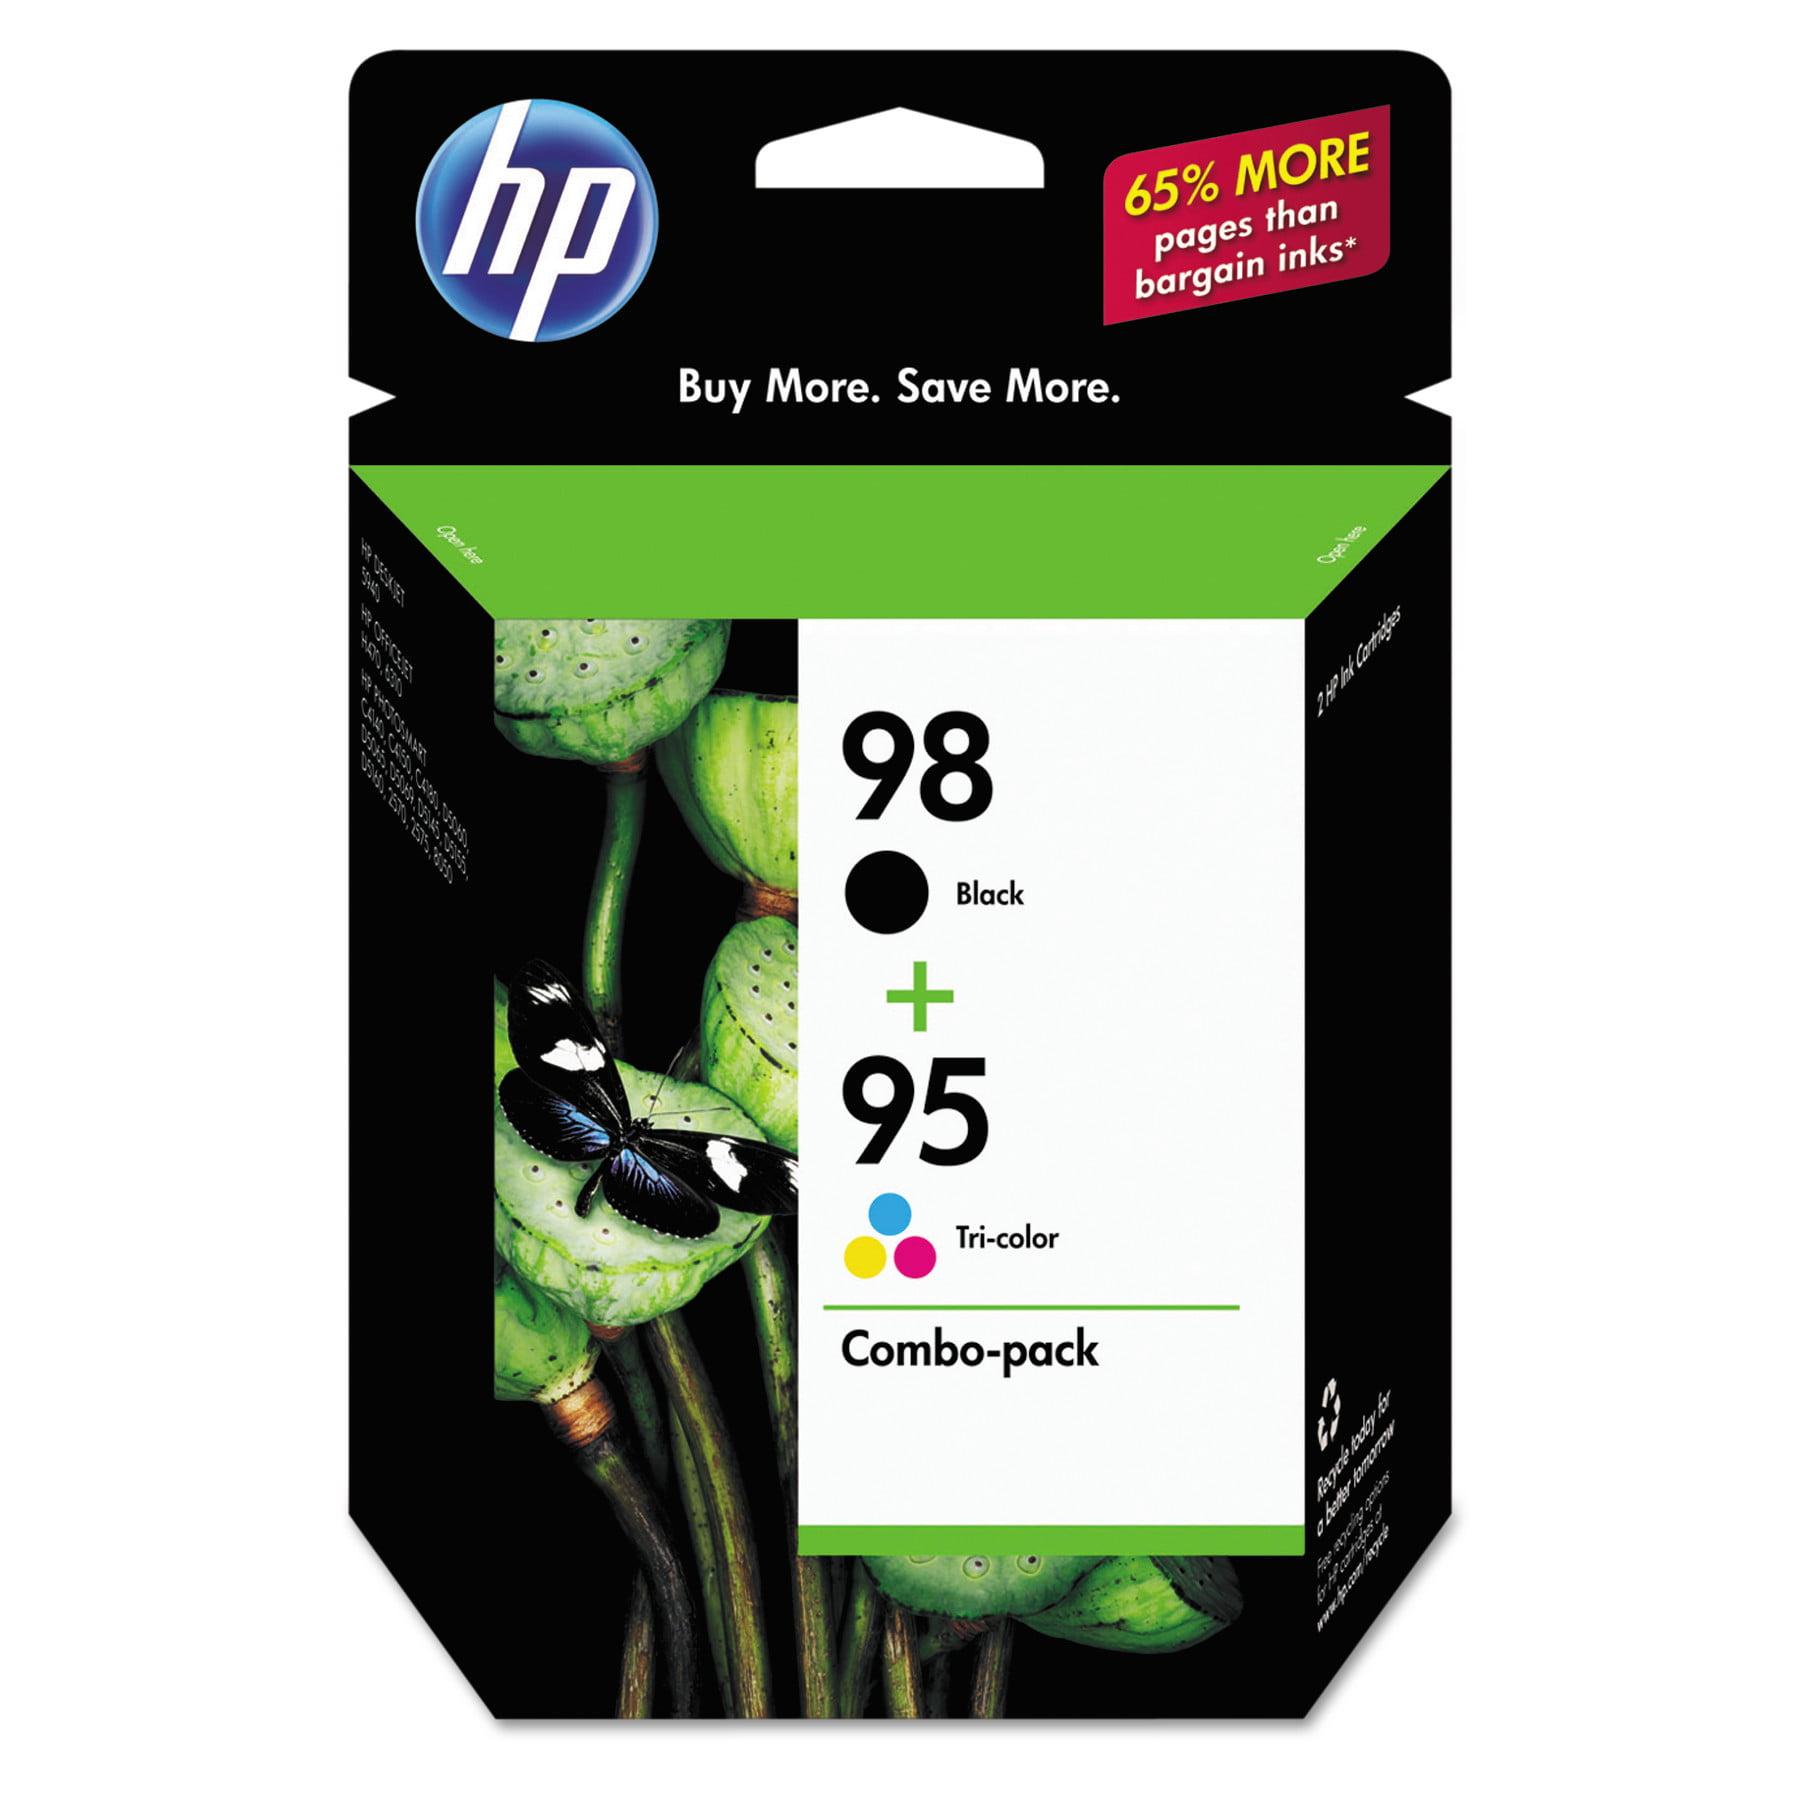 HP 98 Black 95 Tri-color Original Ink Cartridges, 2 pack (CB327FN) by HP